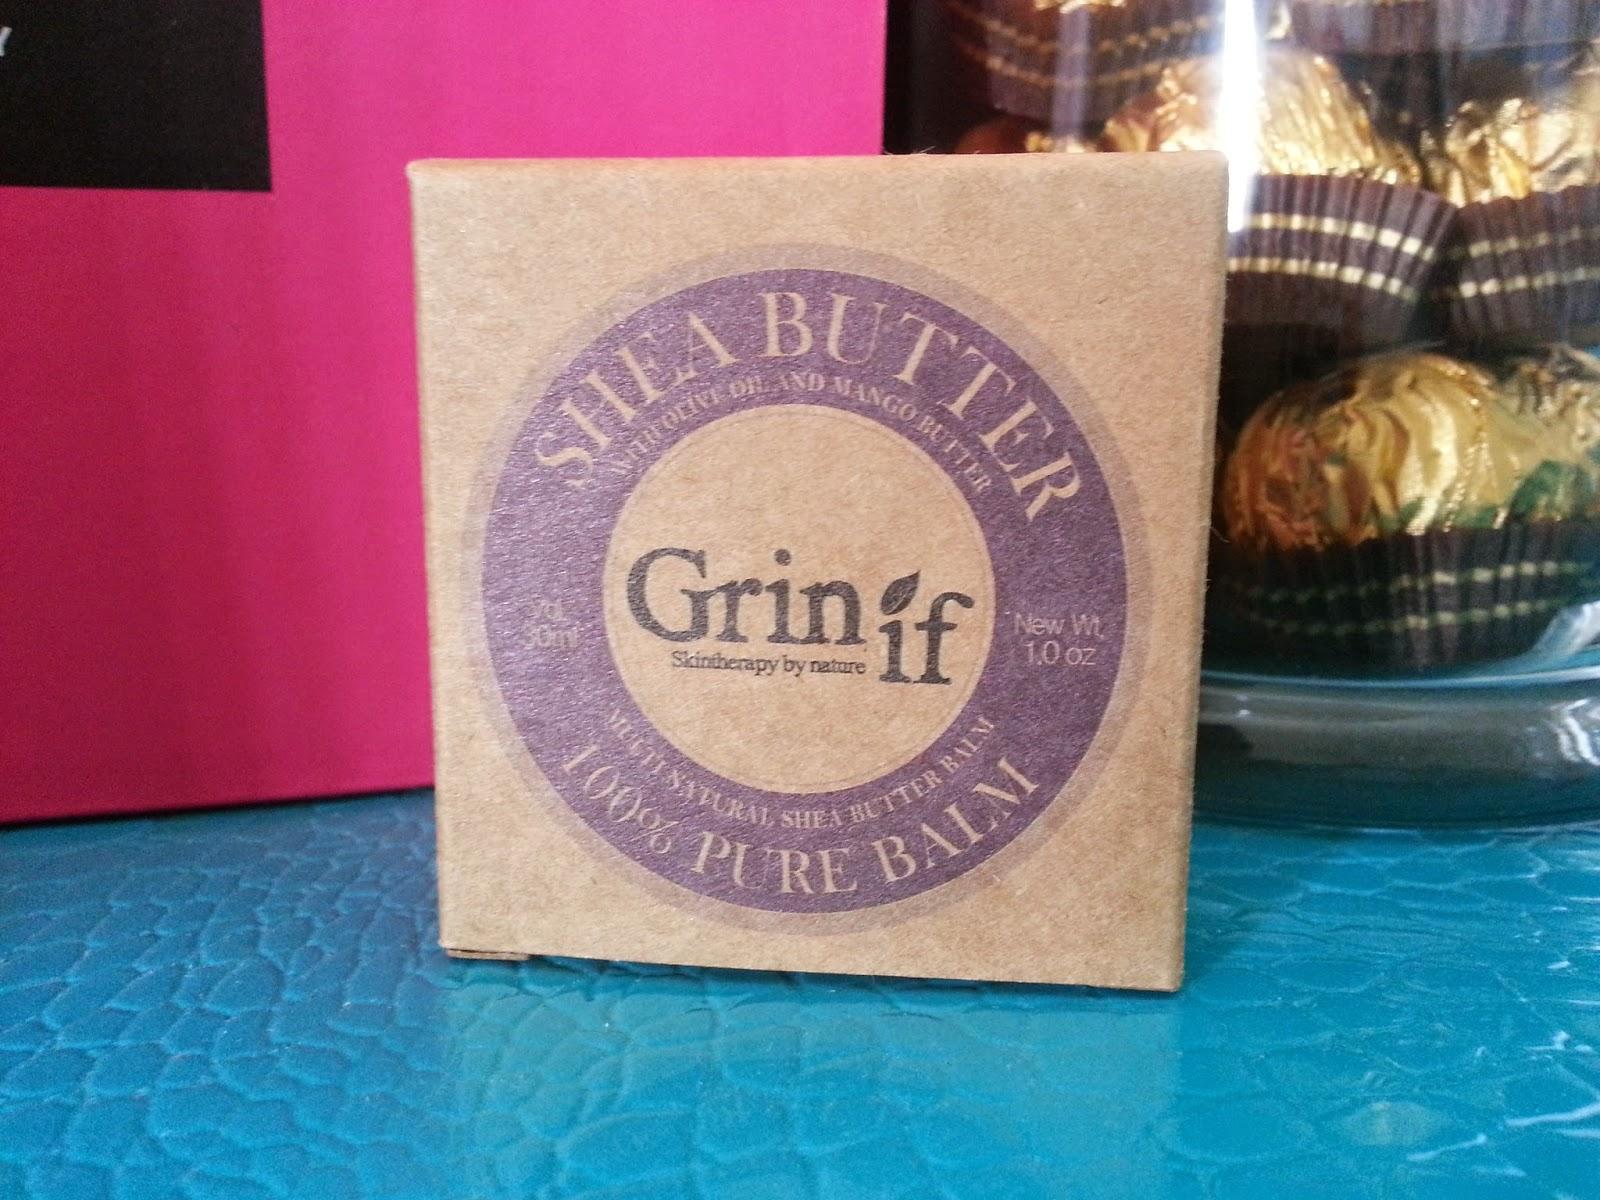 Grinif Shea Butter Multi Balm